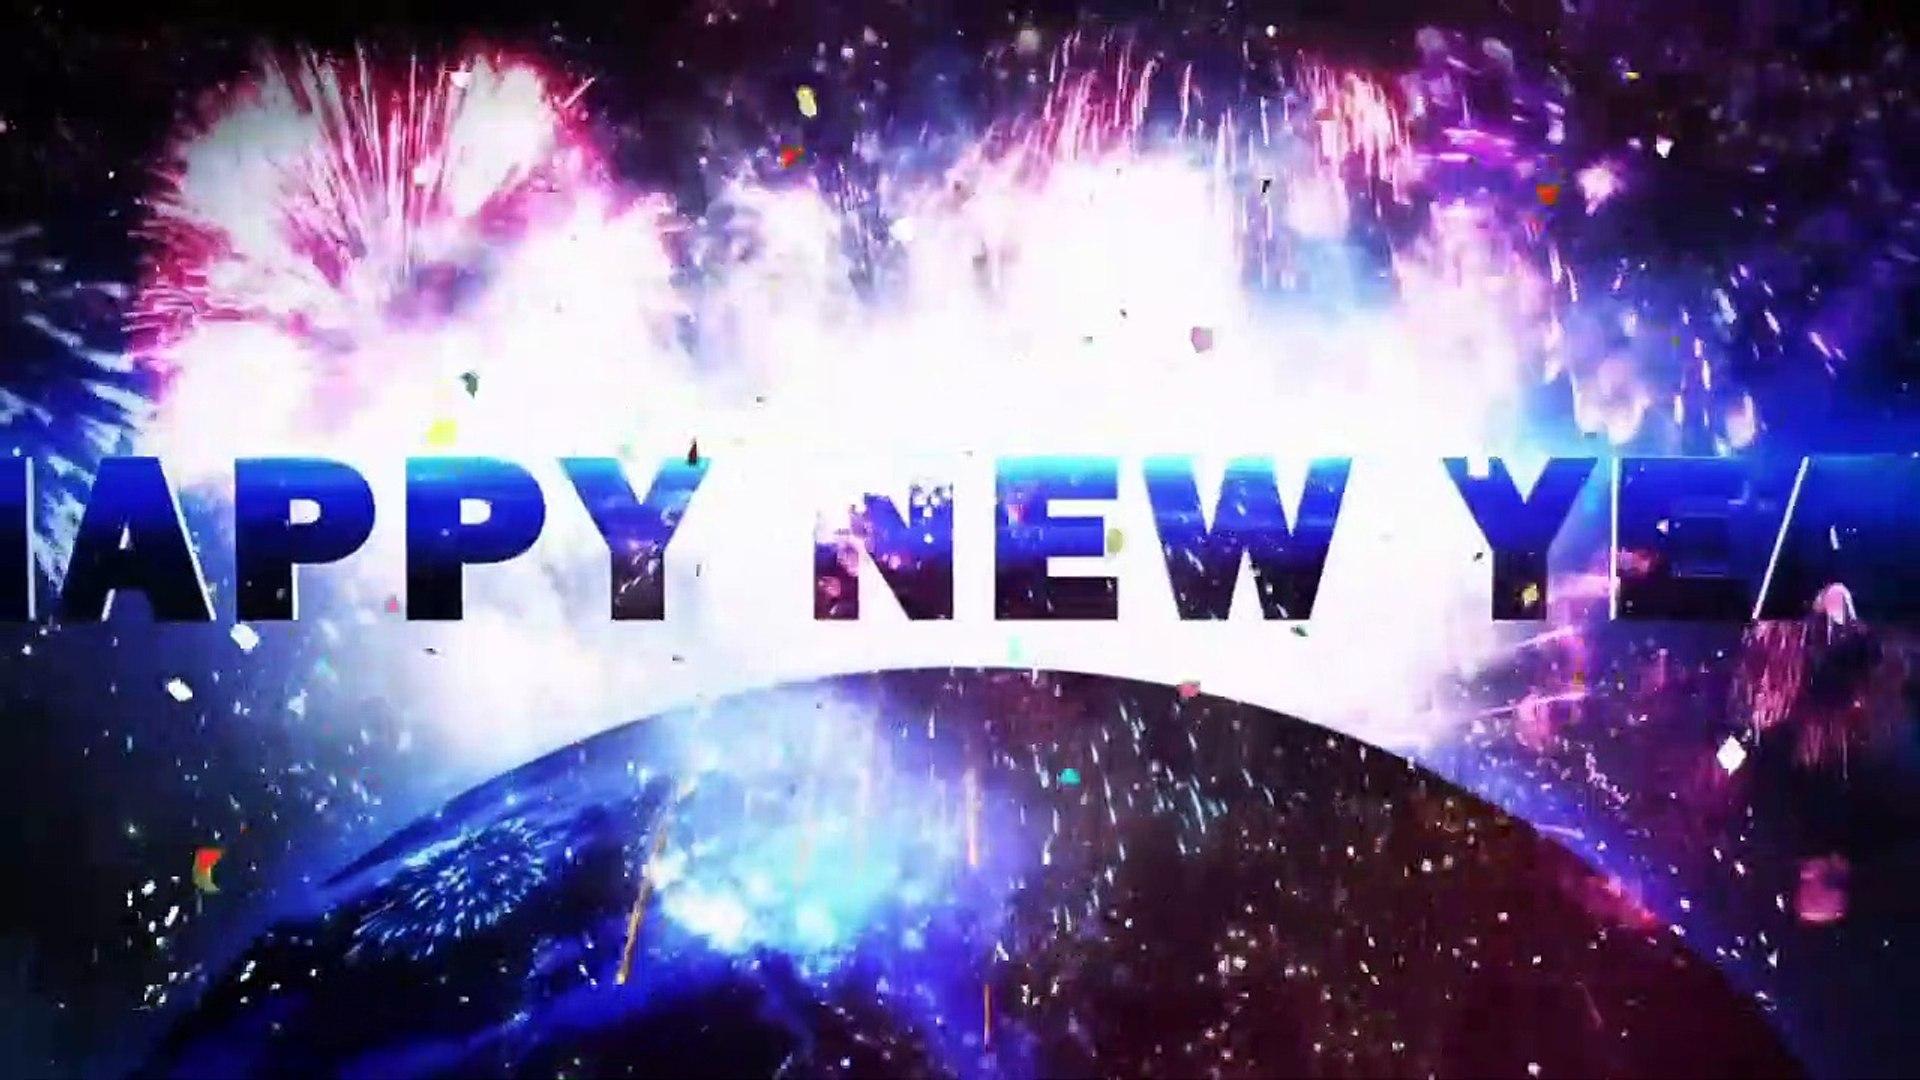 Happy New Year 2020   ☃️_wishing you all Happy year 2020